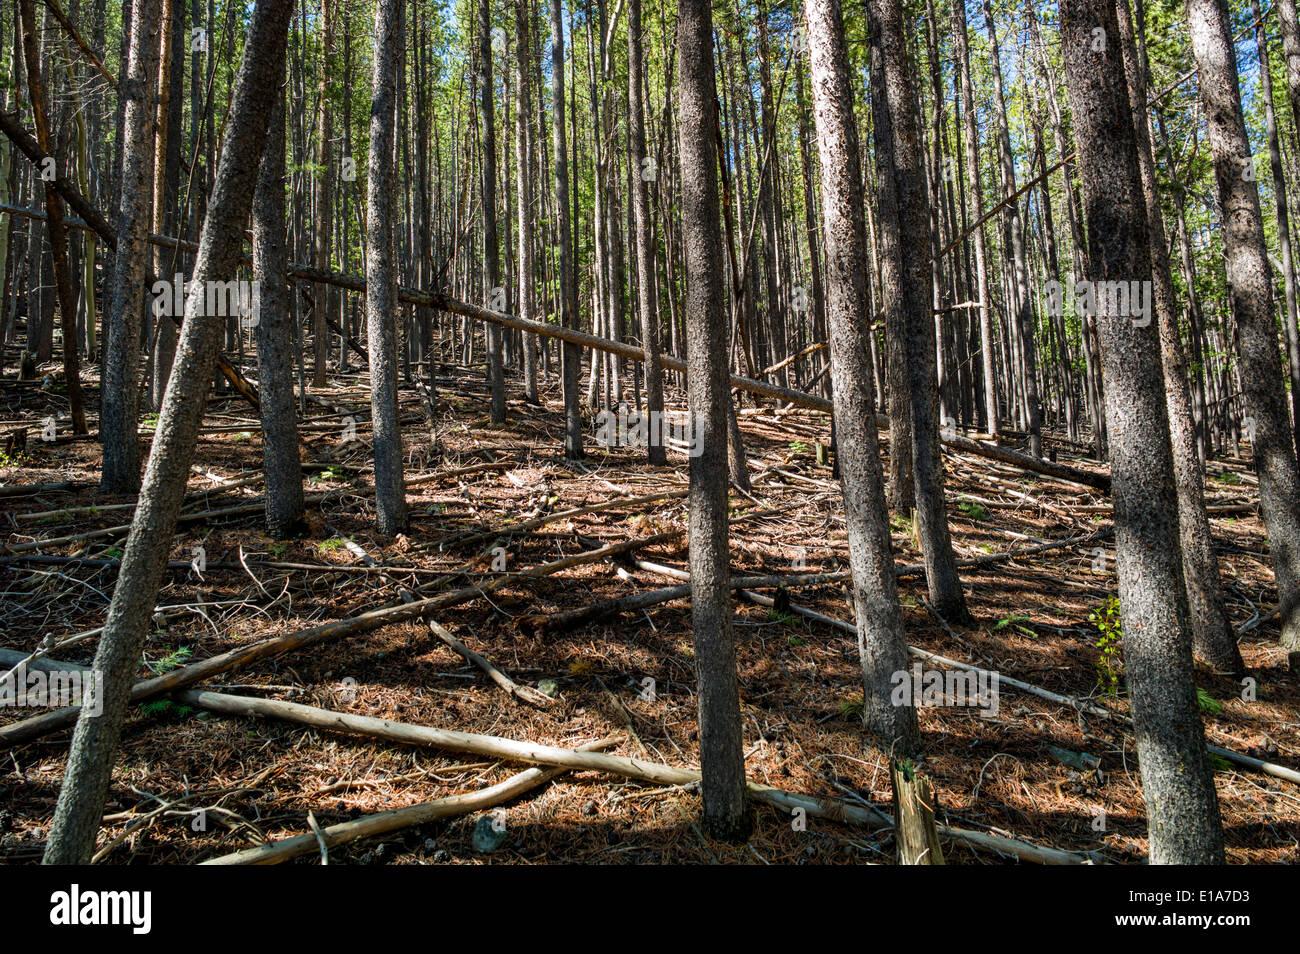 Hain der Kiefer Bäume, Bear Creek, Regenbogen-Trail, Colorado, USA Stockbild